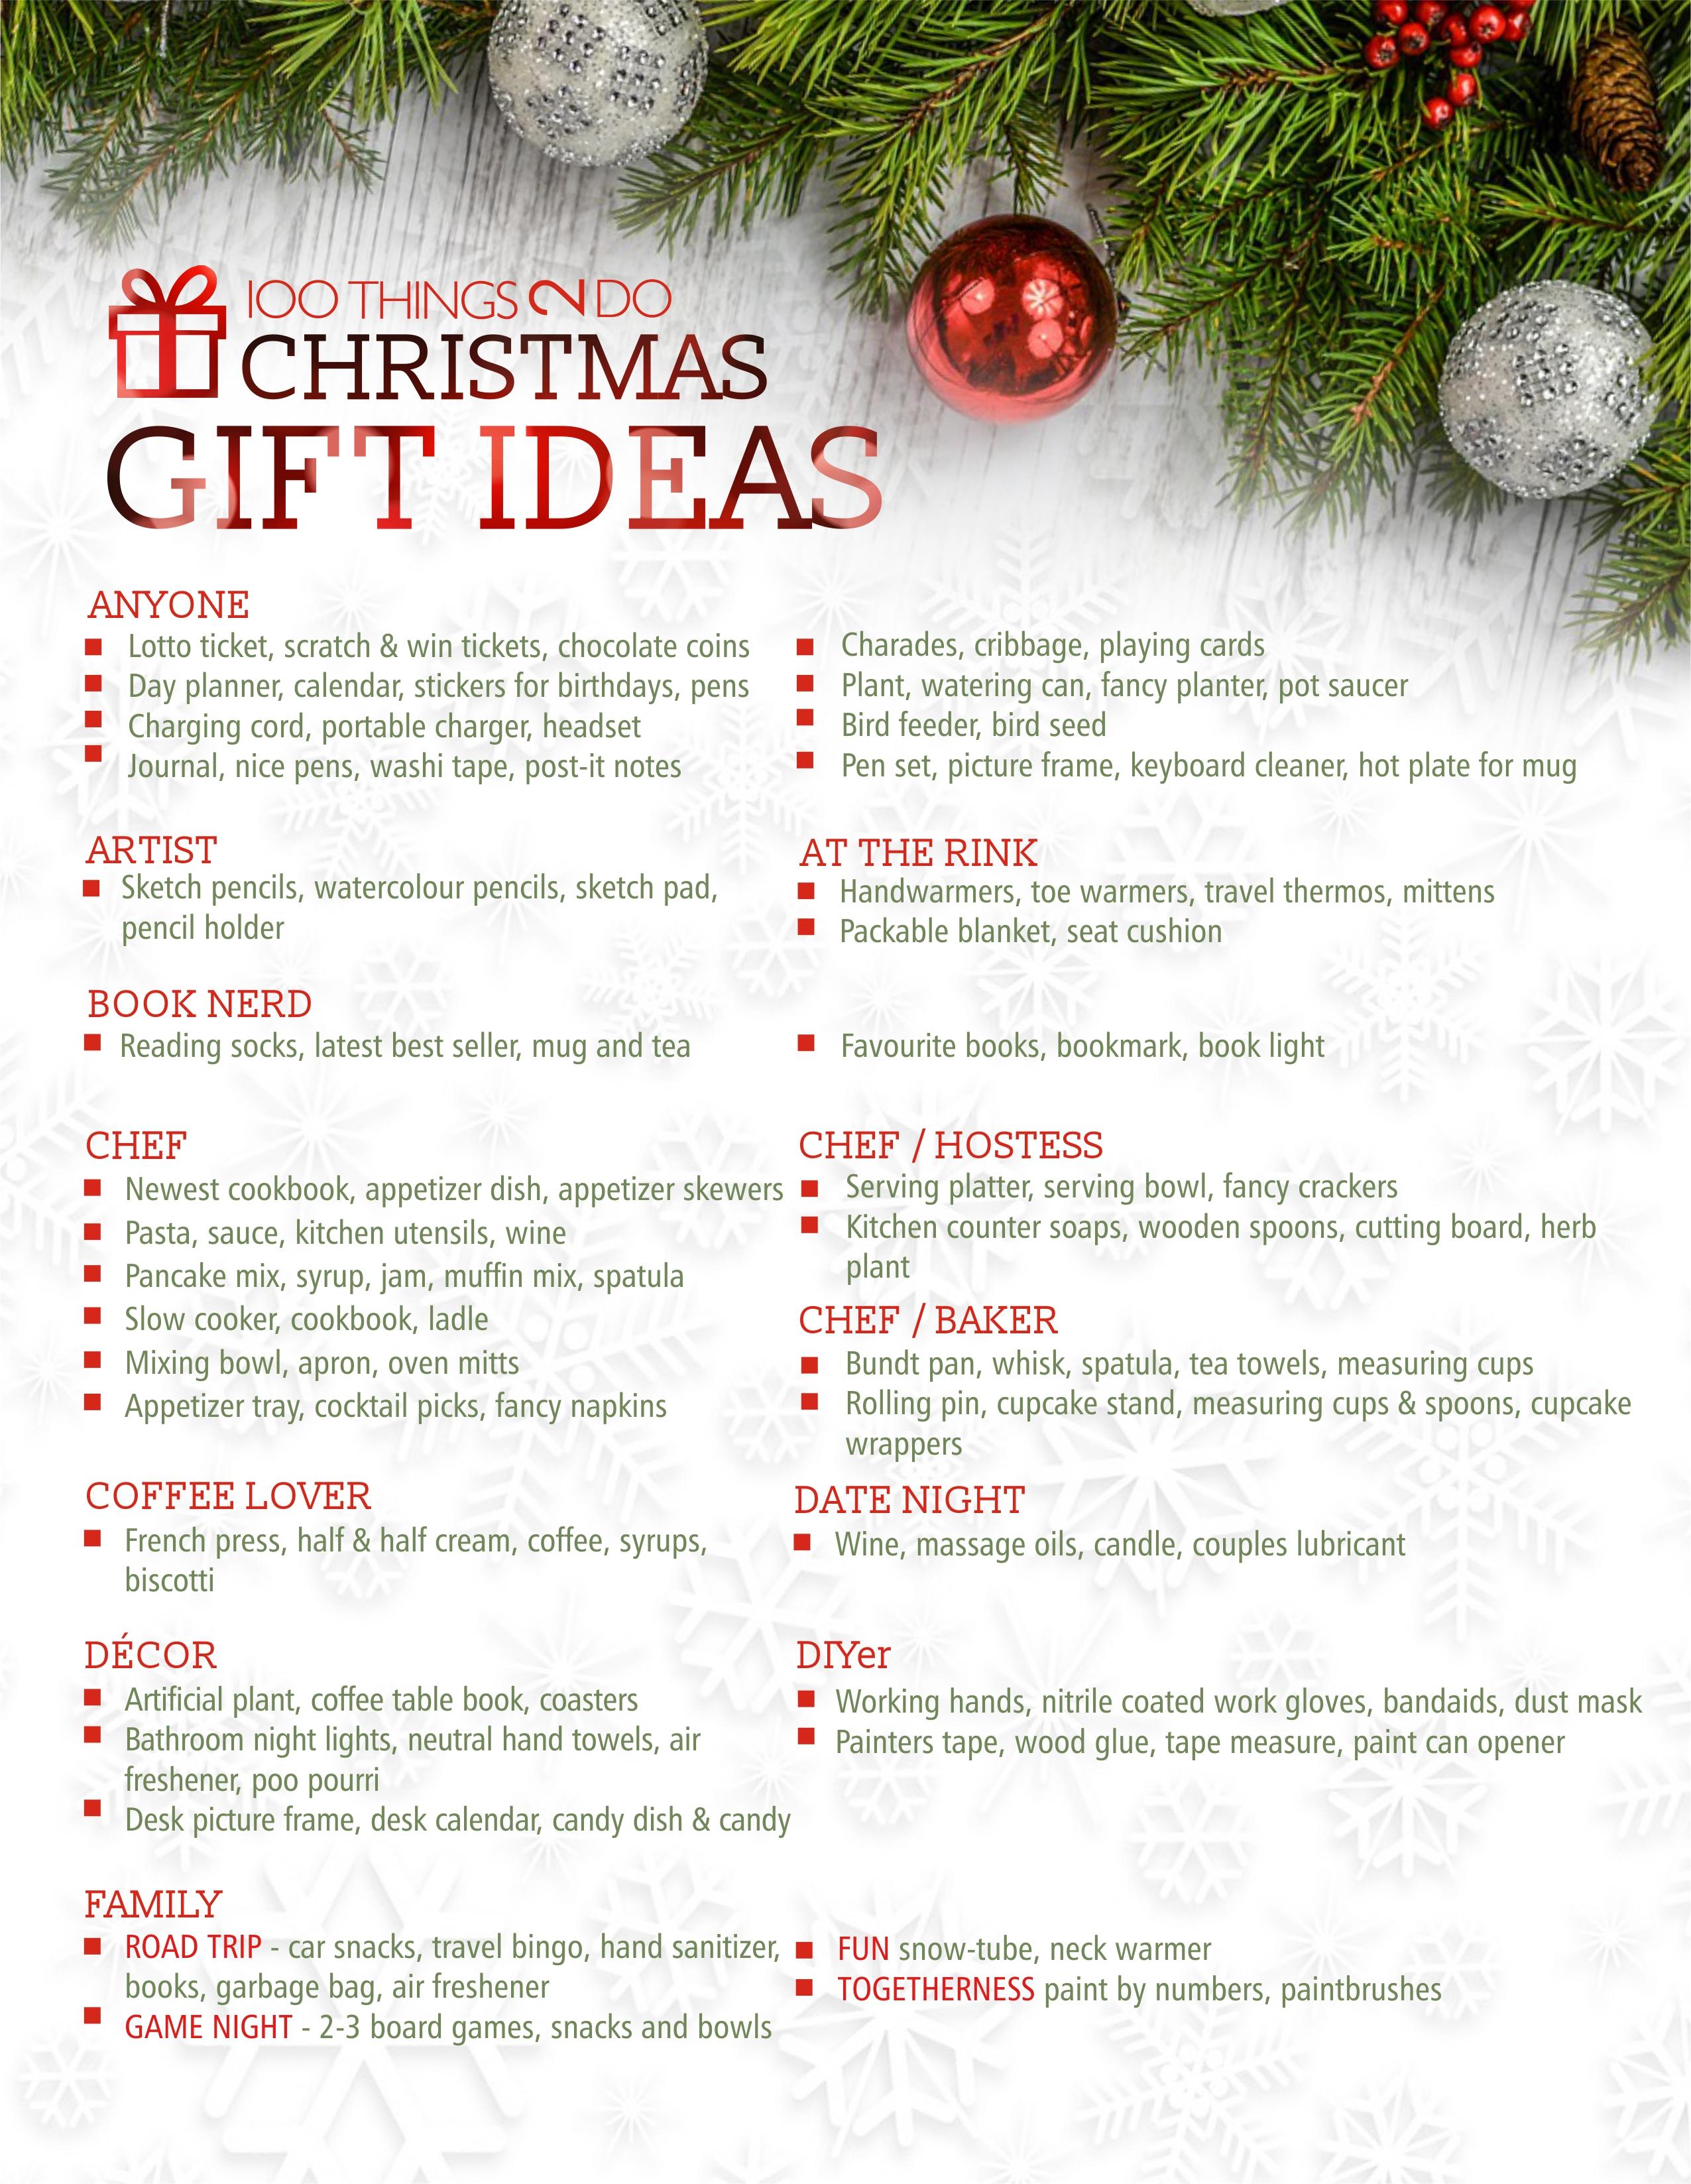 100 christmas gift ideas christmas gift ideas 100 gift ideas